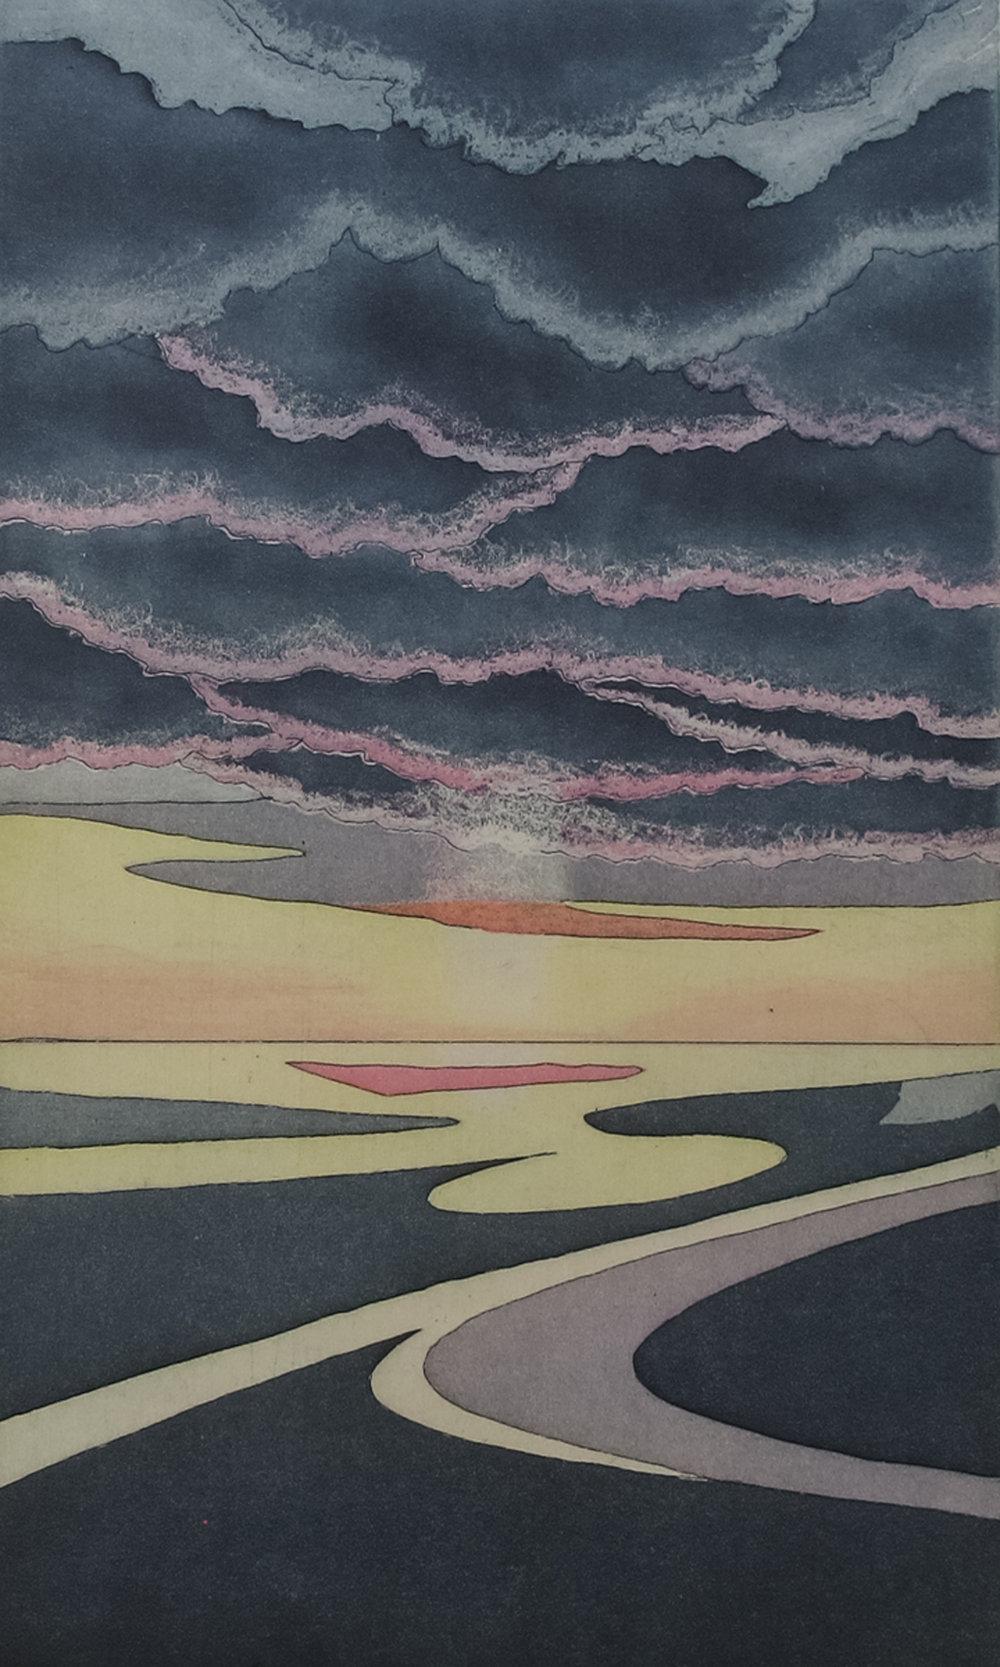 Clara Ueland, Daybreak, intaglio